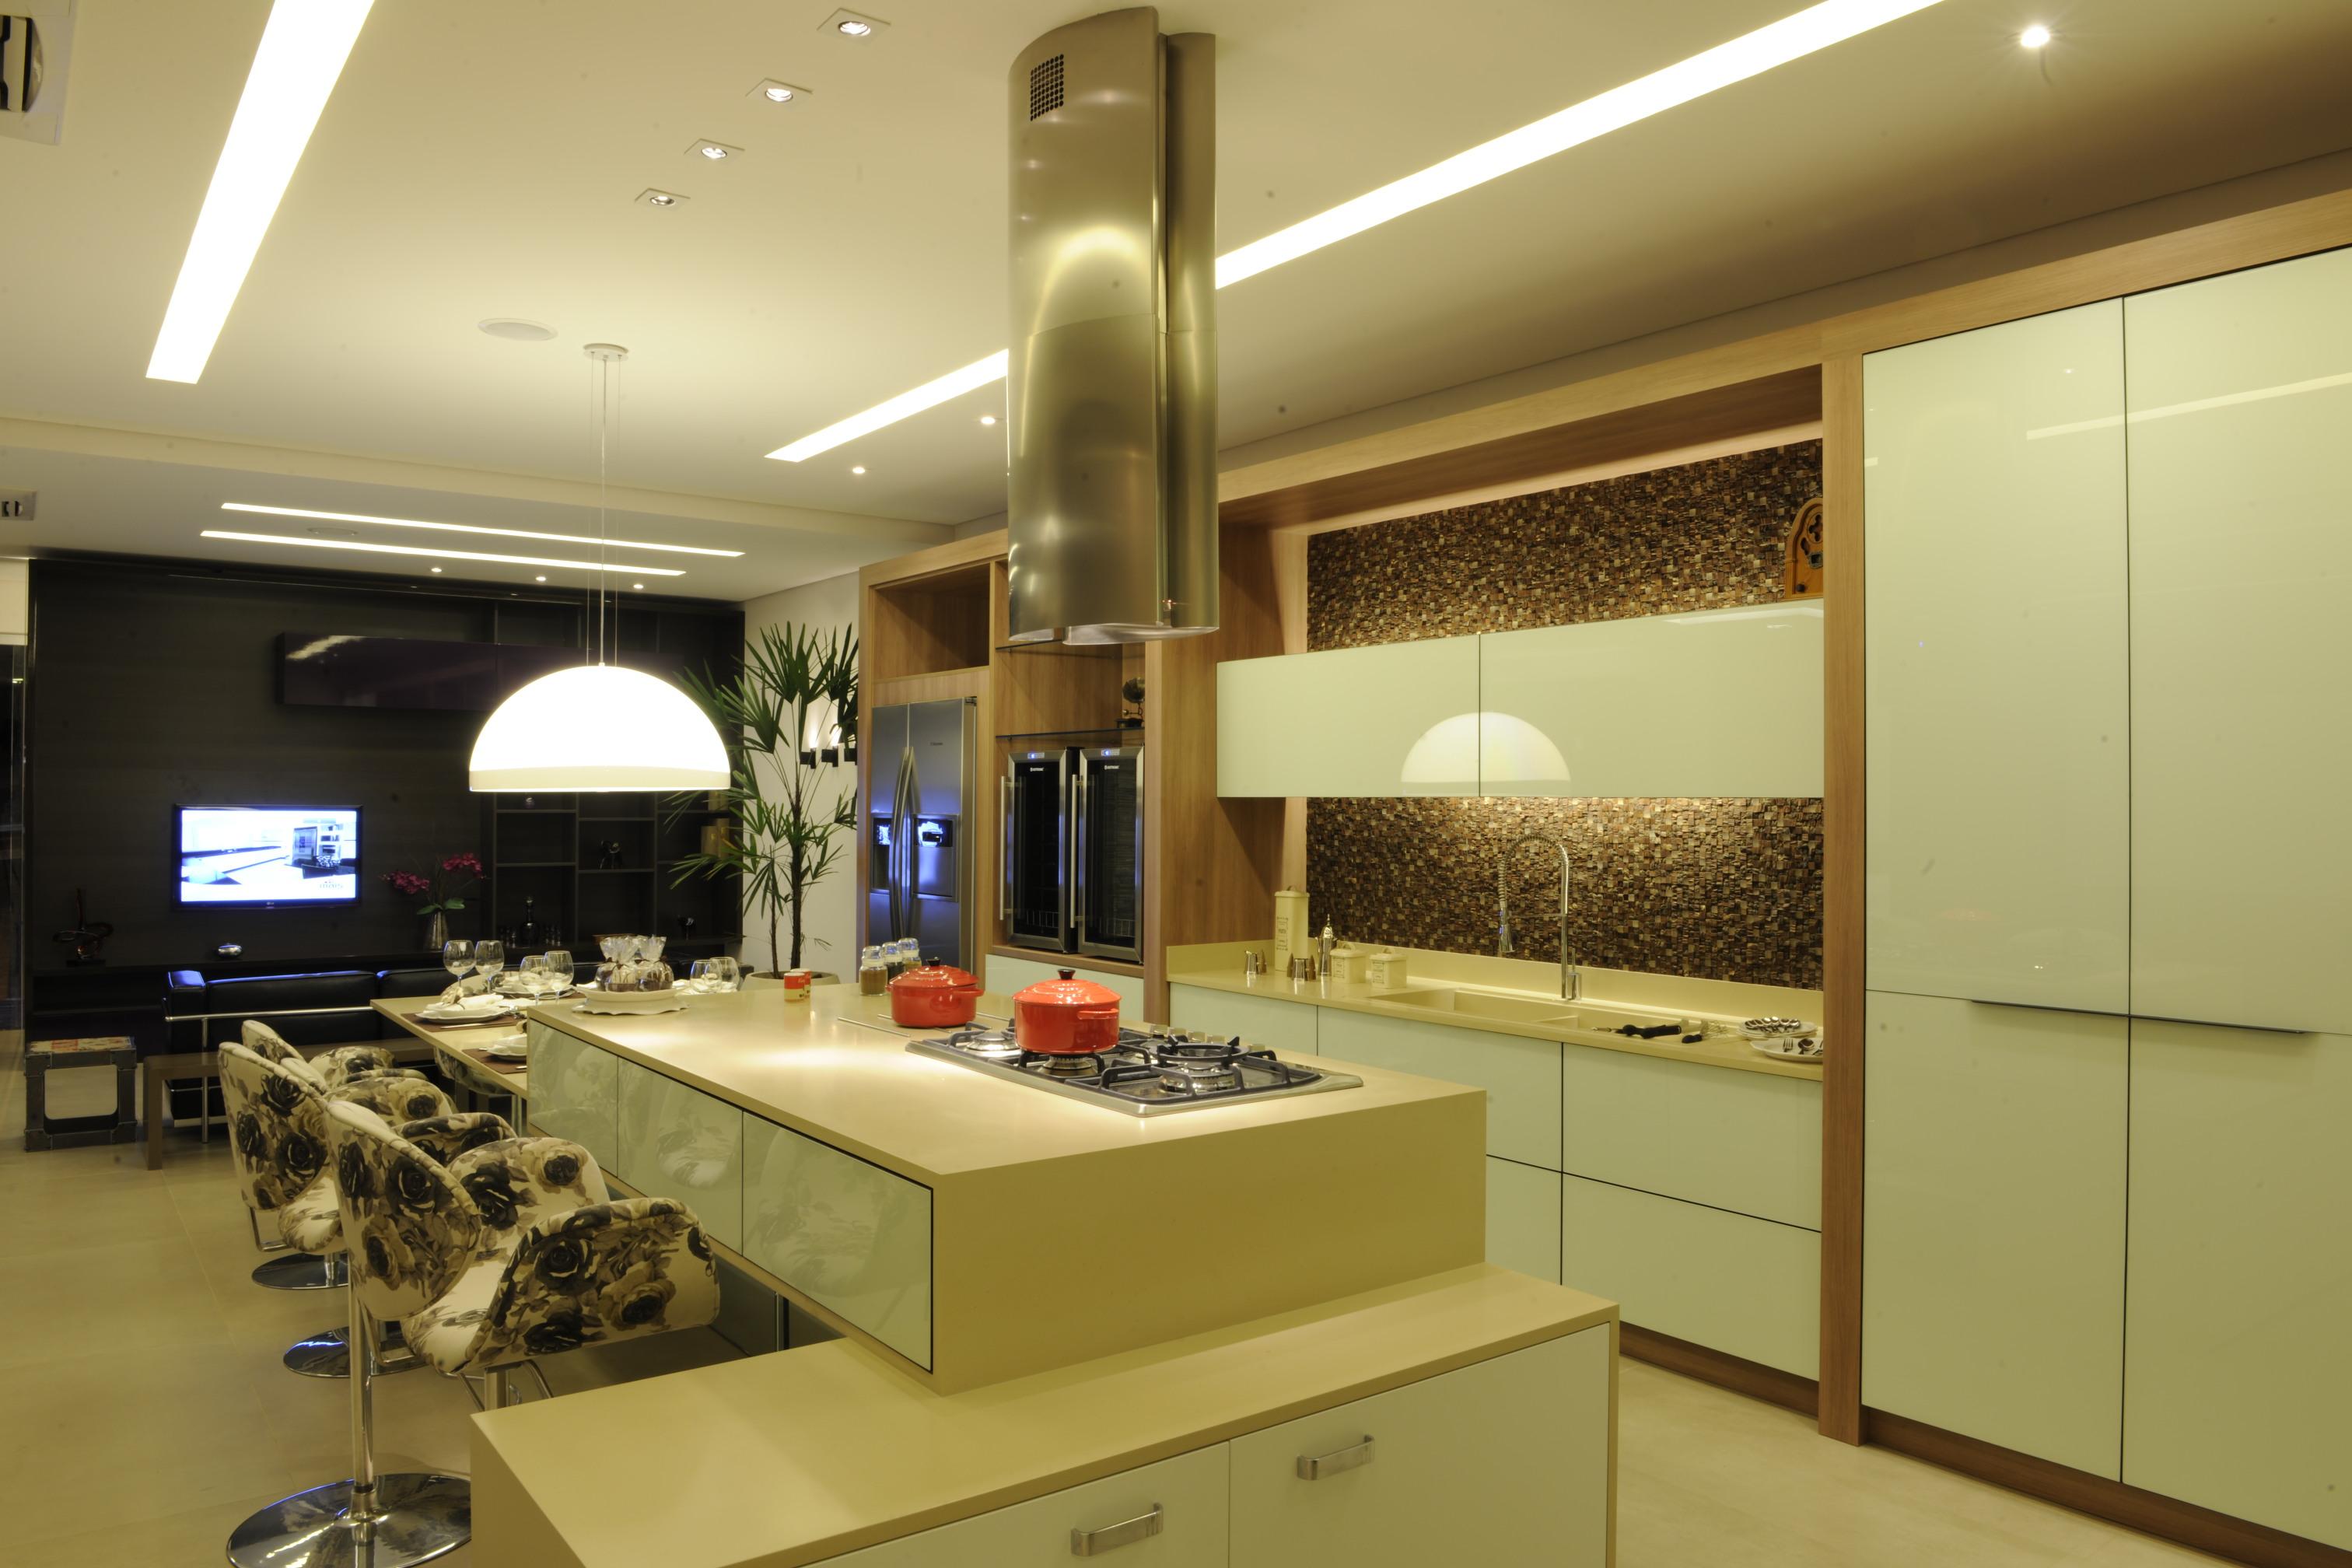 Cozinha Corian 5